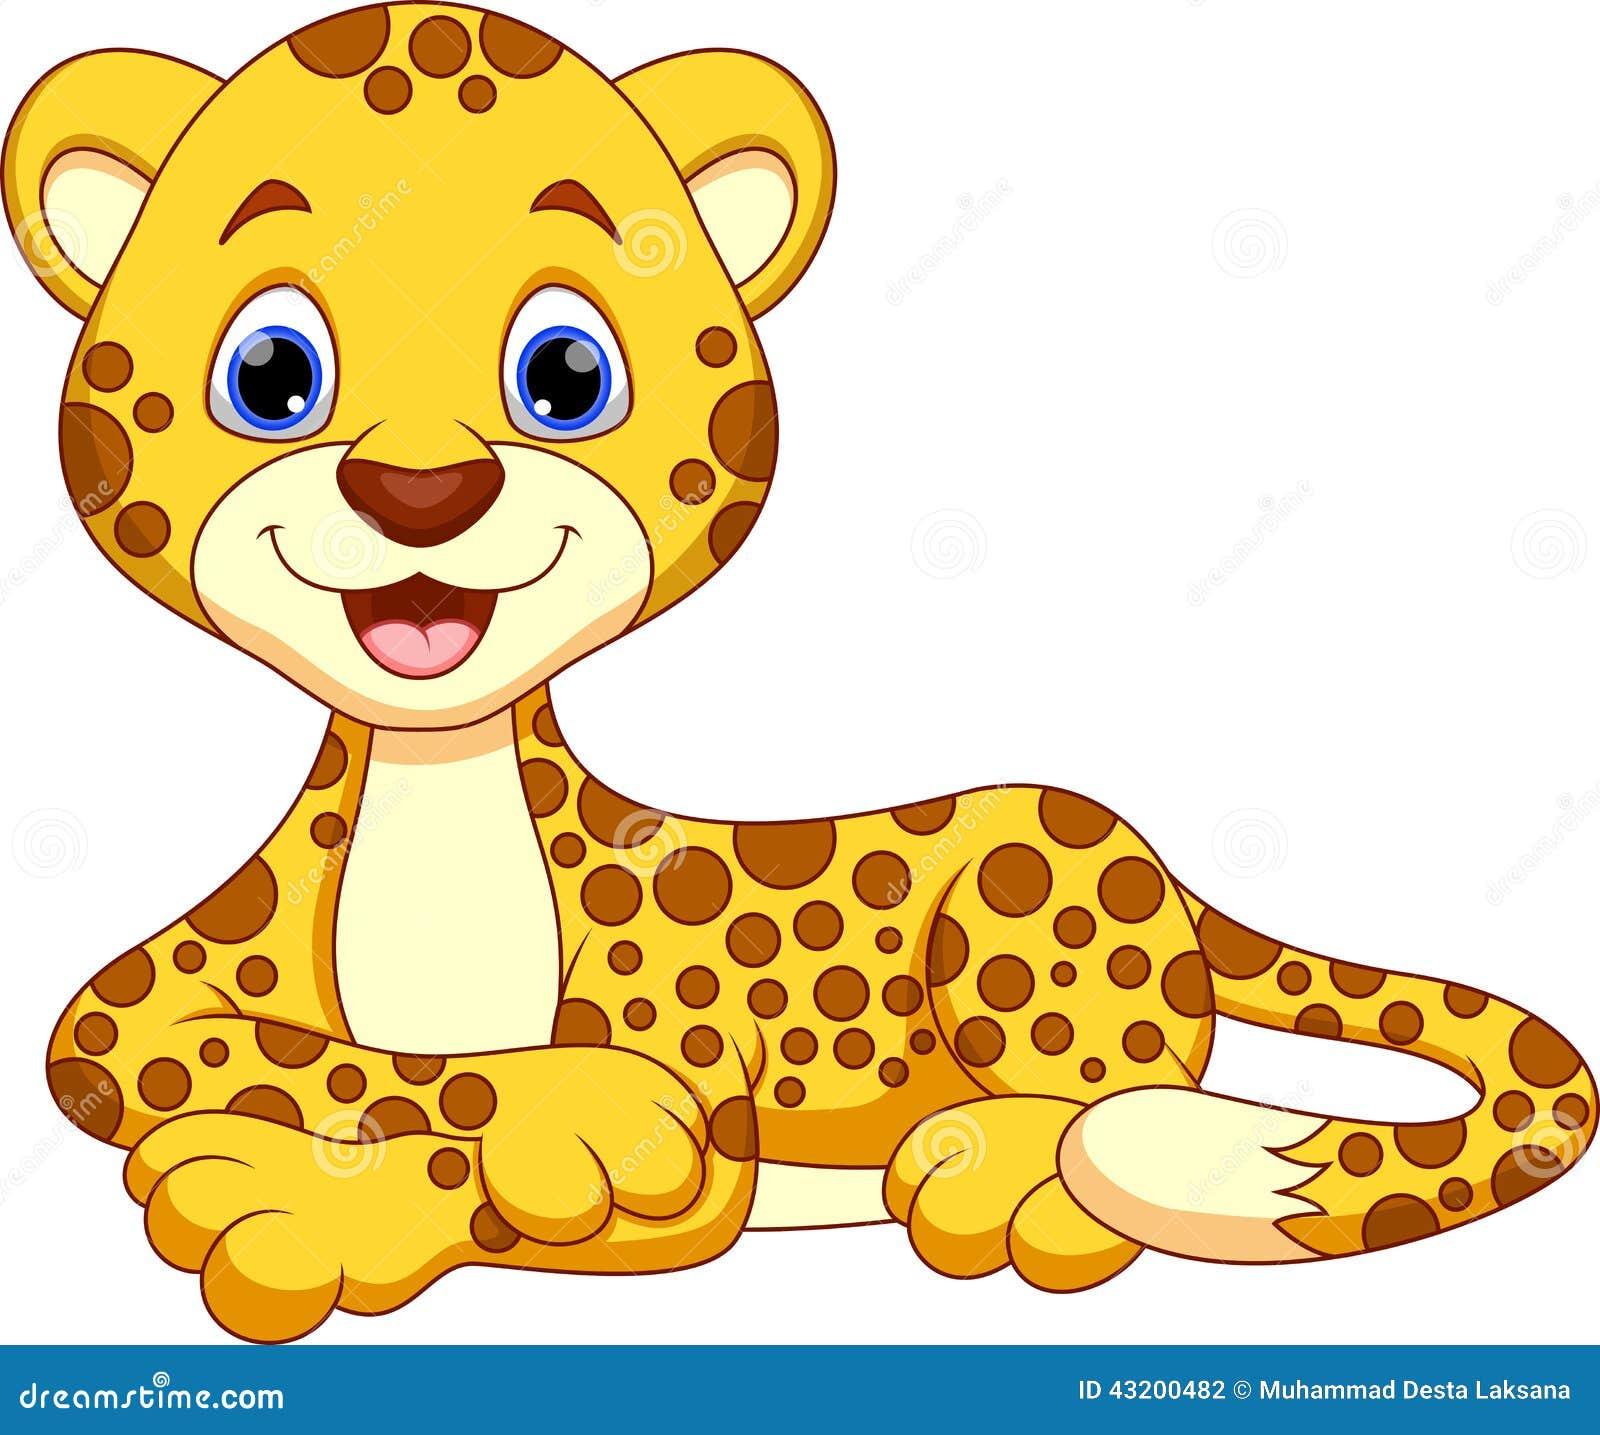 Cute Cheetah Cartoon Stock Illustration - Image: 43200482